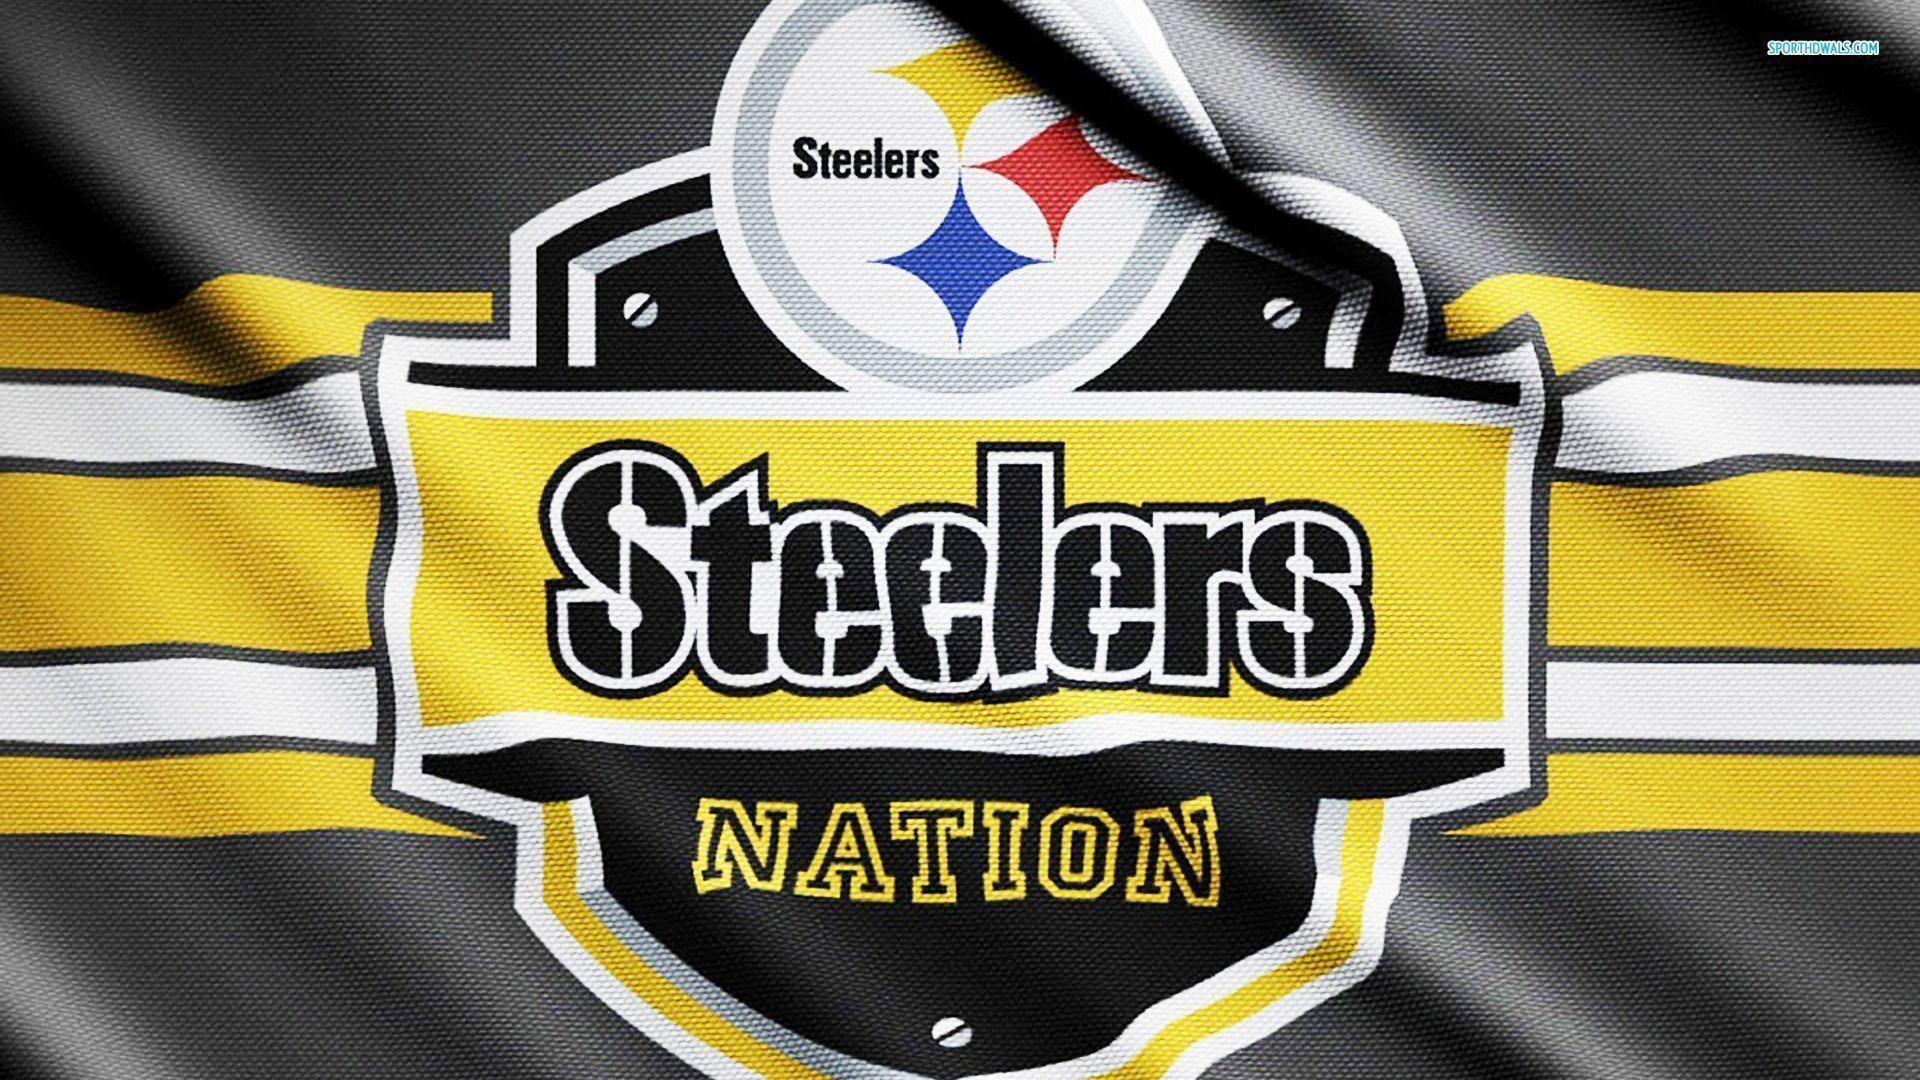 Steelers Screensavers and Wallpaper